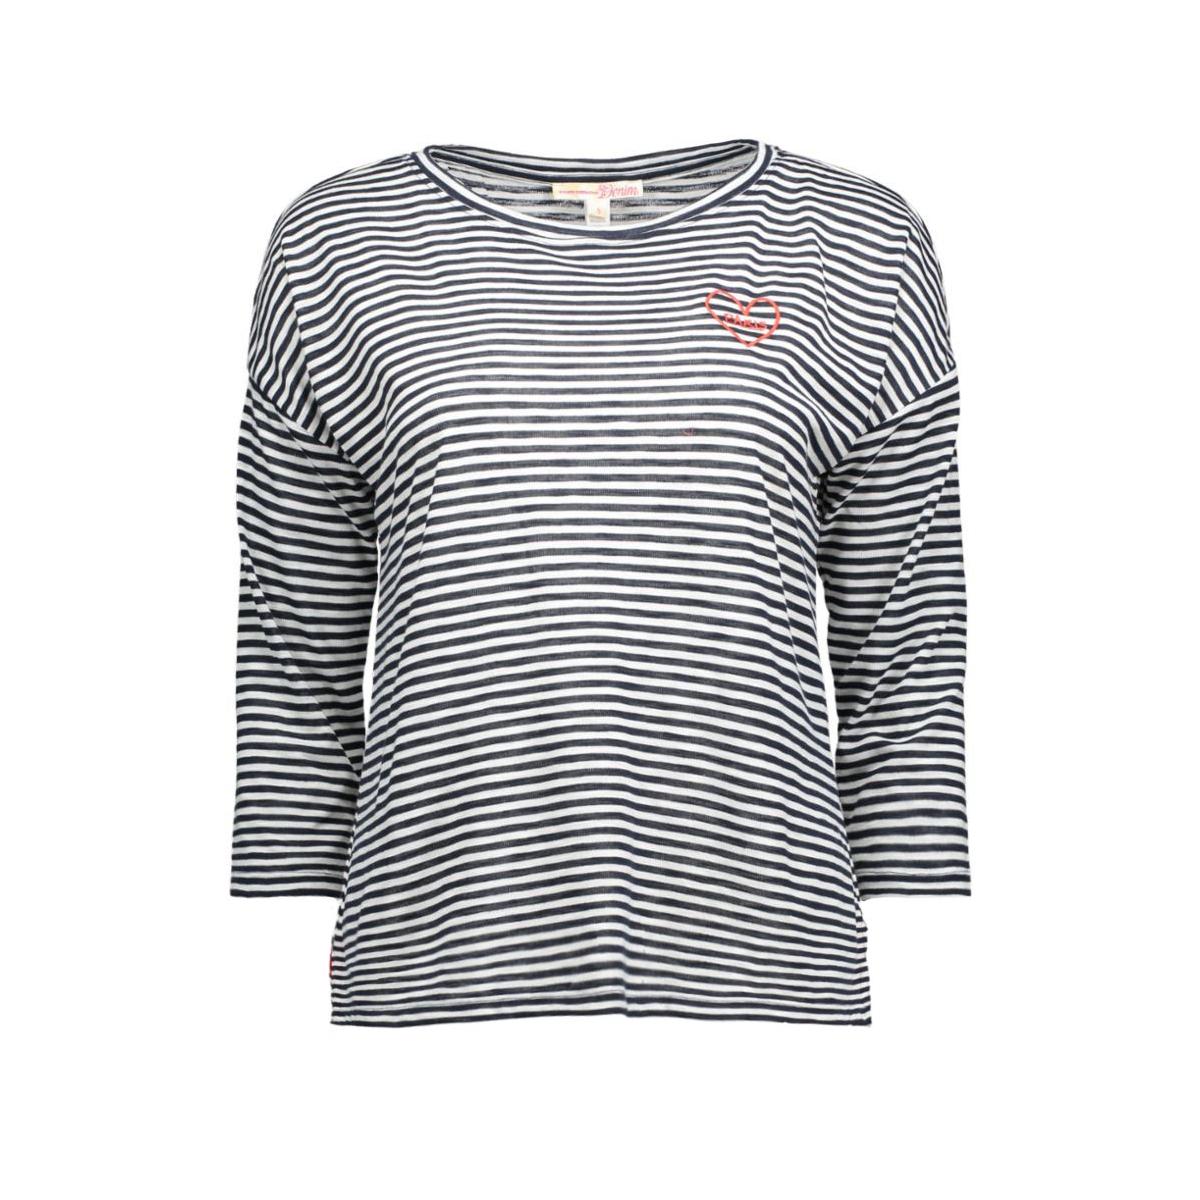 10355320071 tom tailor t-shirt 6901